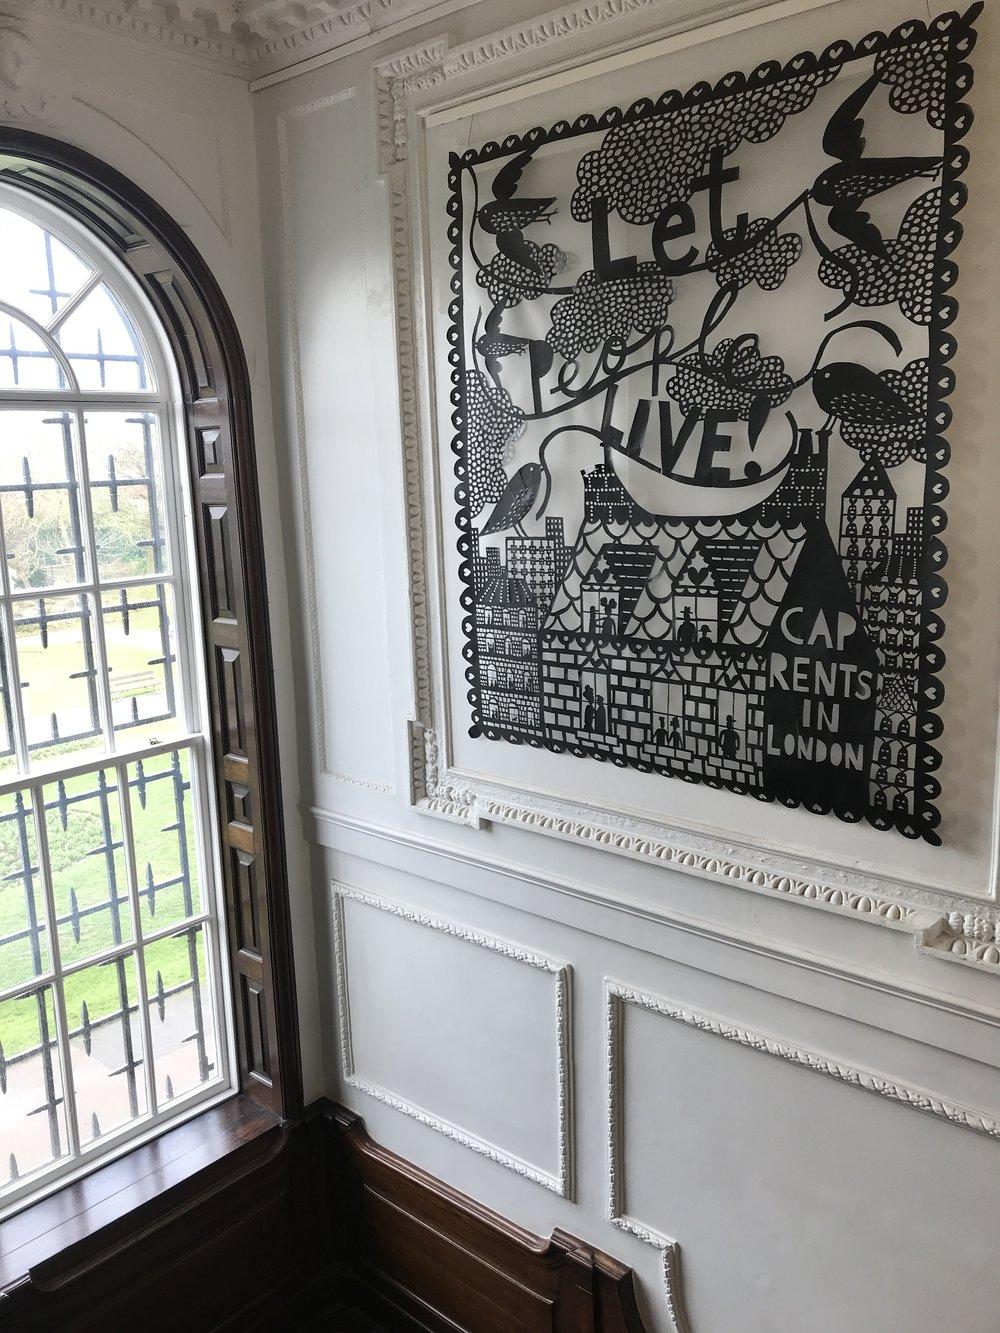 - Rob Ryan, 'Let People Live! Cap Rents in London' (2018) in situ at the William Morris Gallery, Walthamstow